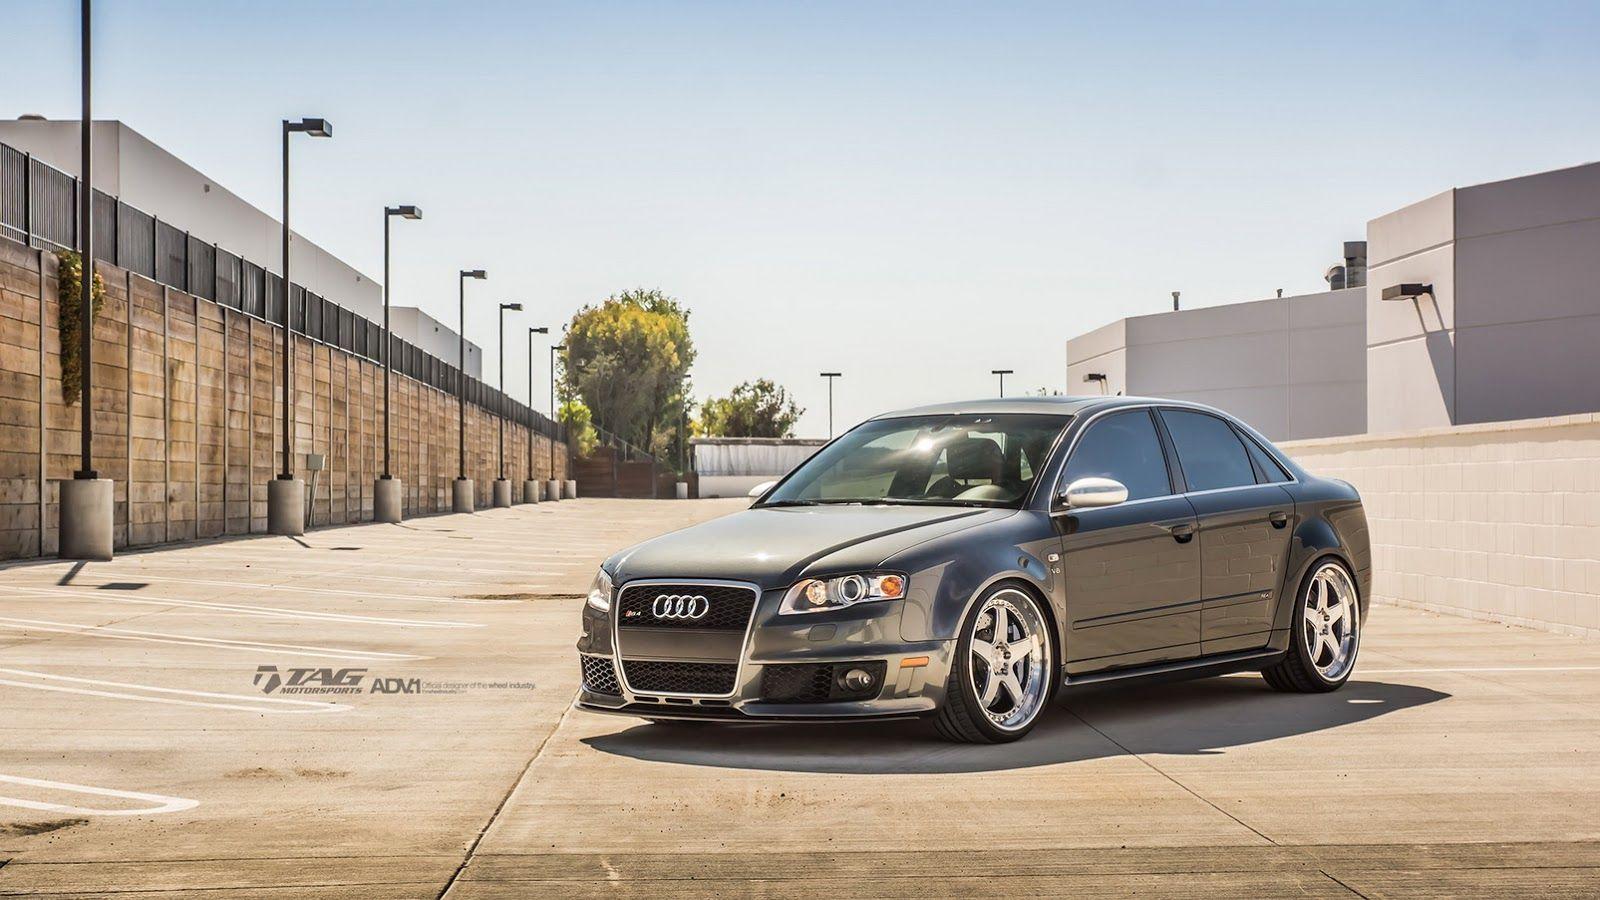 Audi Rs4 B7 Wearing 20 Brushed Aluminum Wheels Carscoops Audi Rs4 B7 Audi Rs4 Audi B7